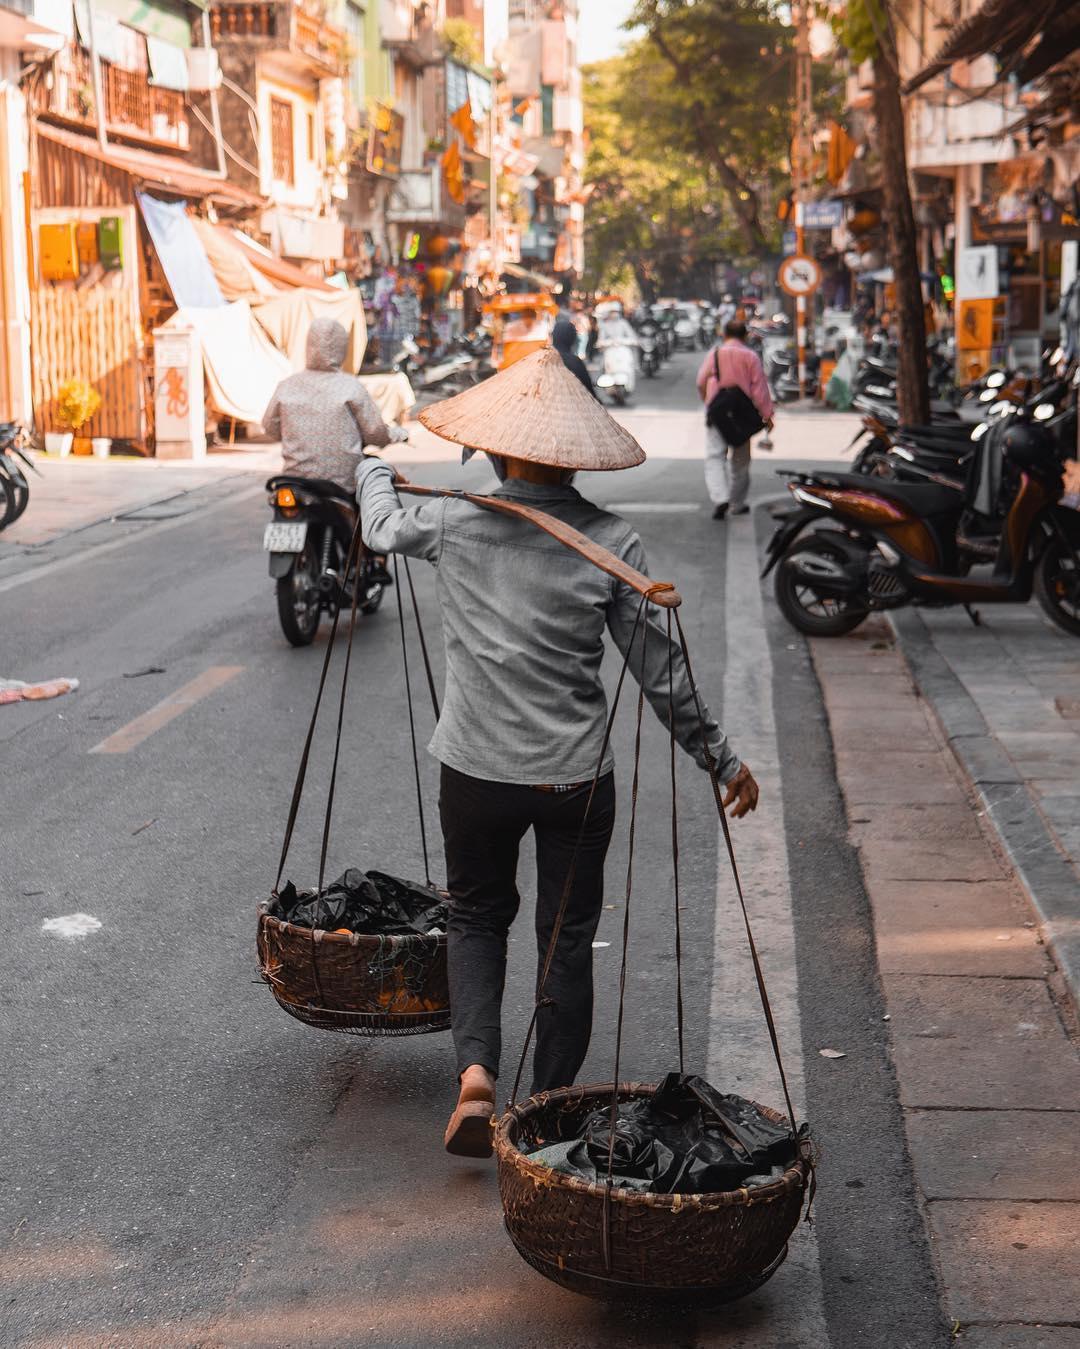 Remote Year Balboa in Hanoi Vietnam | Remote Year